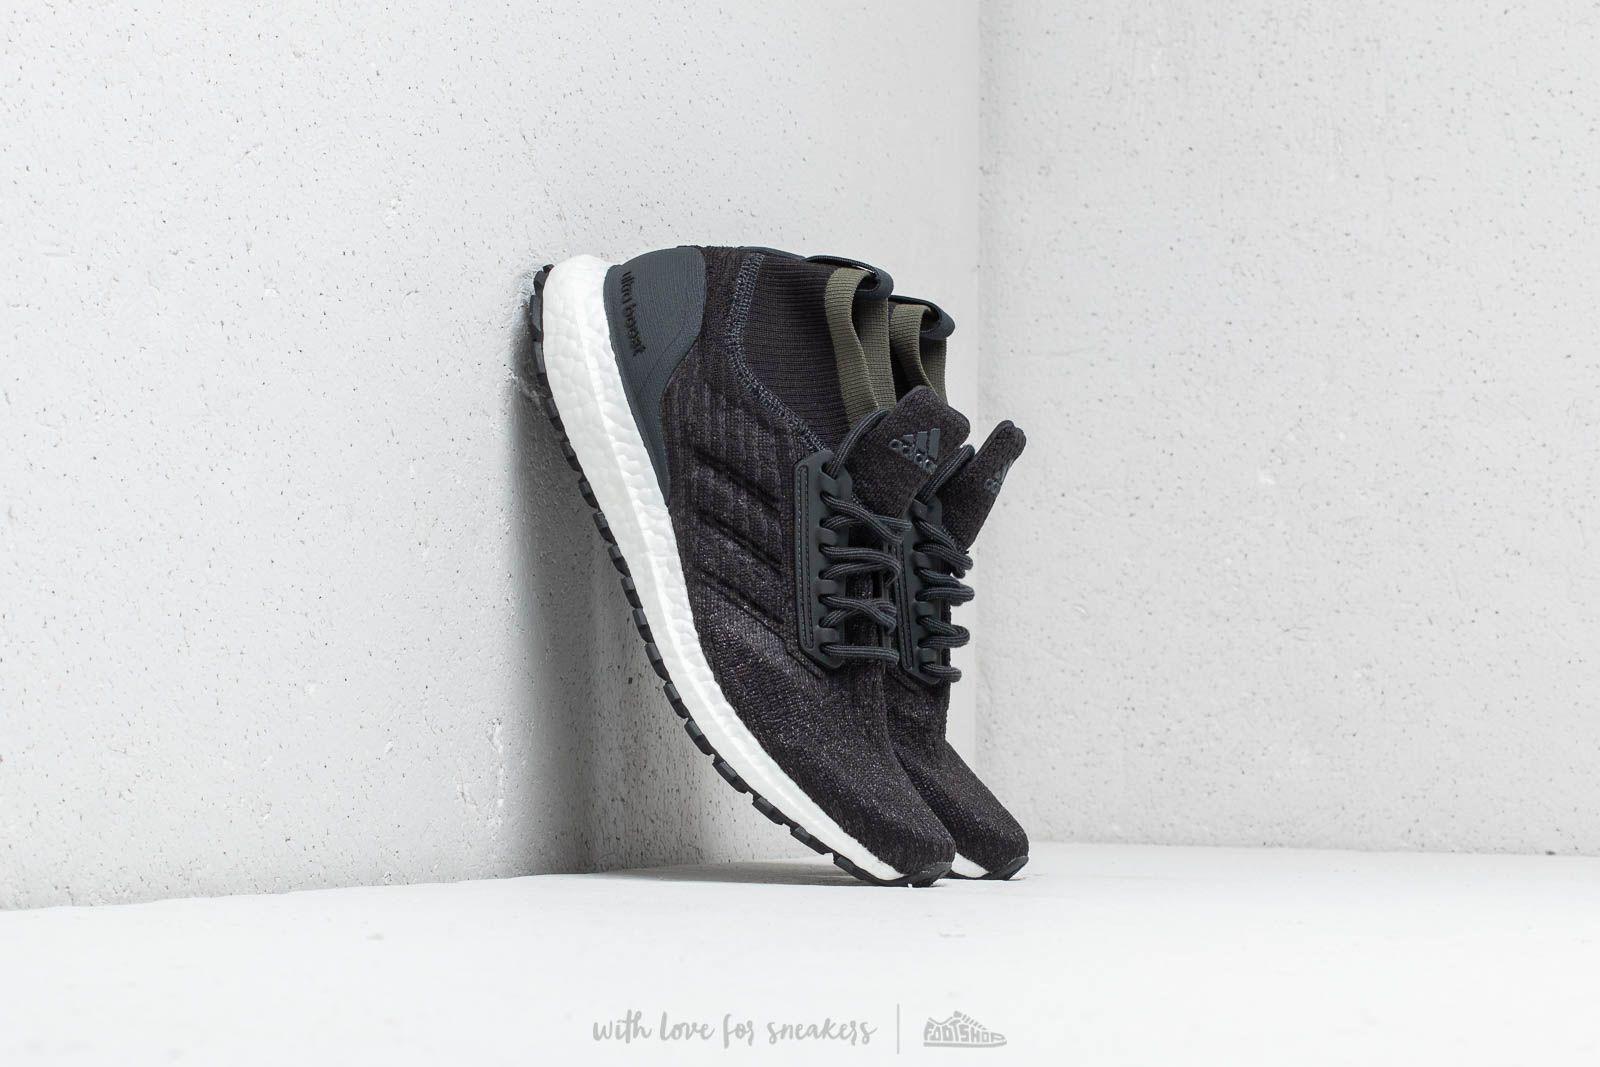 adidas UltraBOOST All Terrain Carbon/ Core Black/ Cloud White za skvělou cenu 3 770 Kč koupíte na Footshop.cz